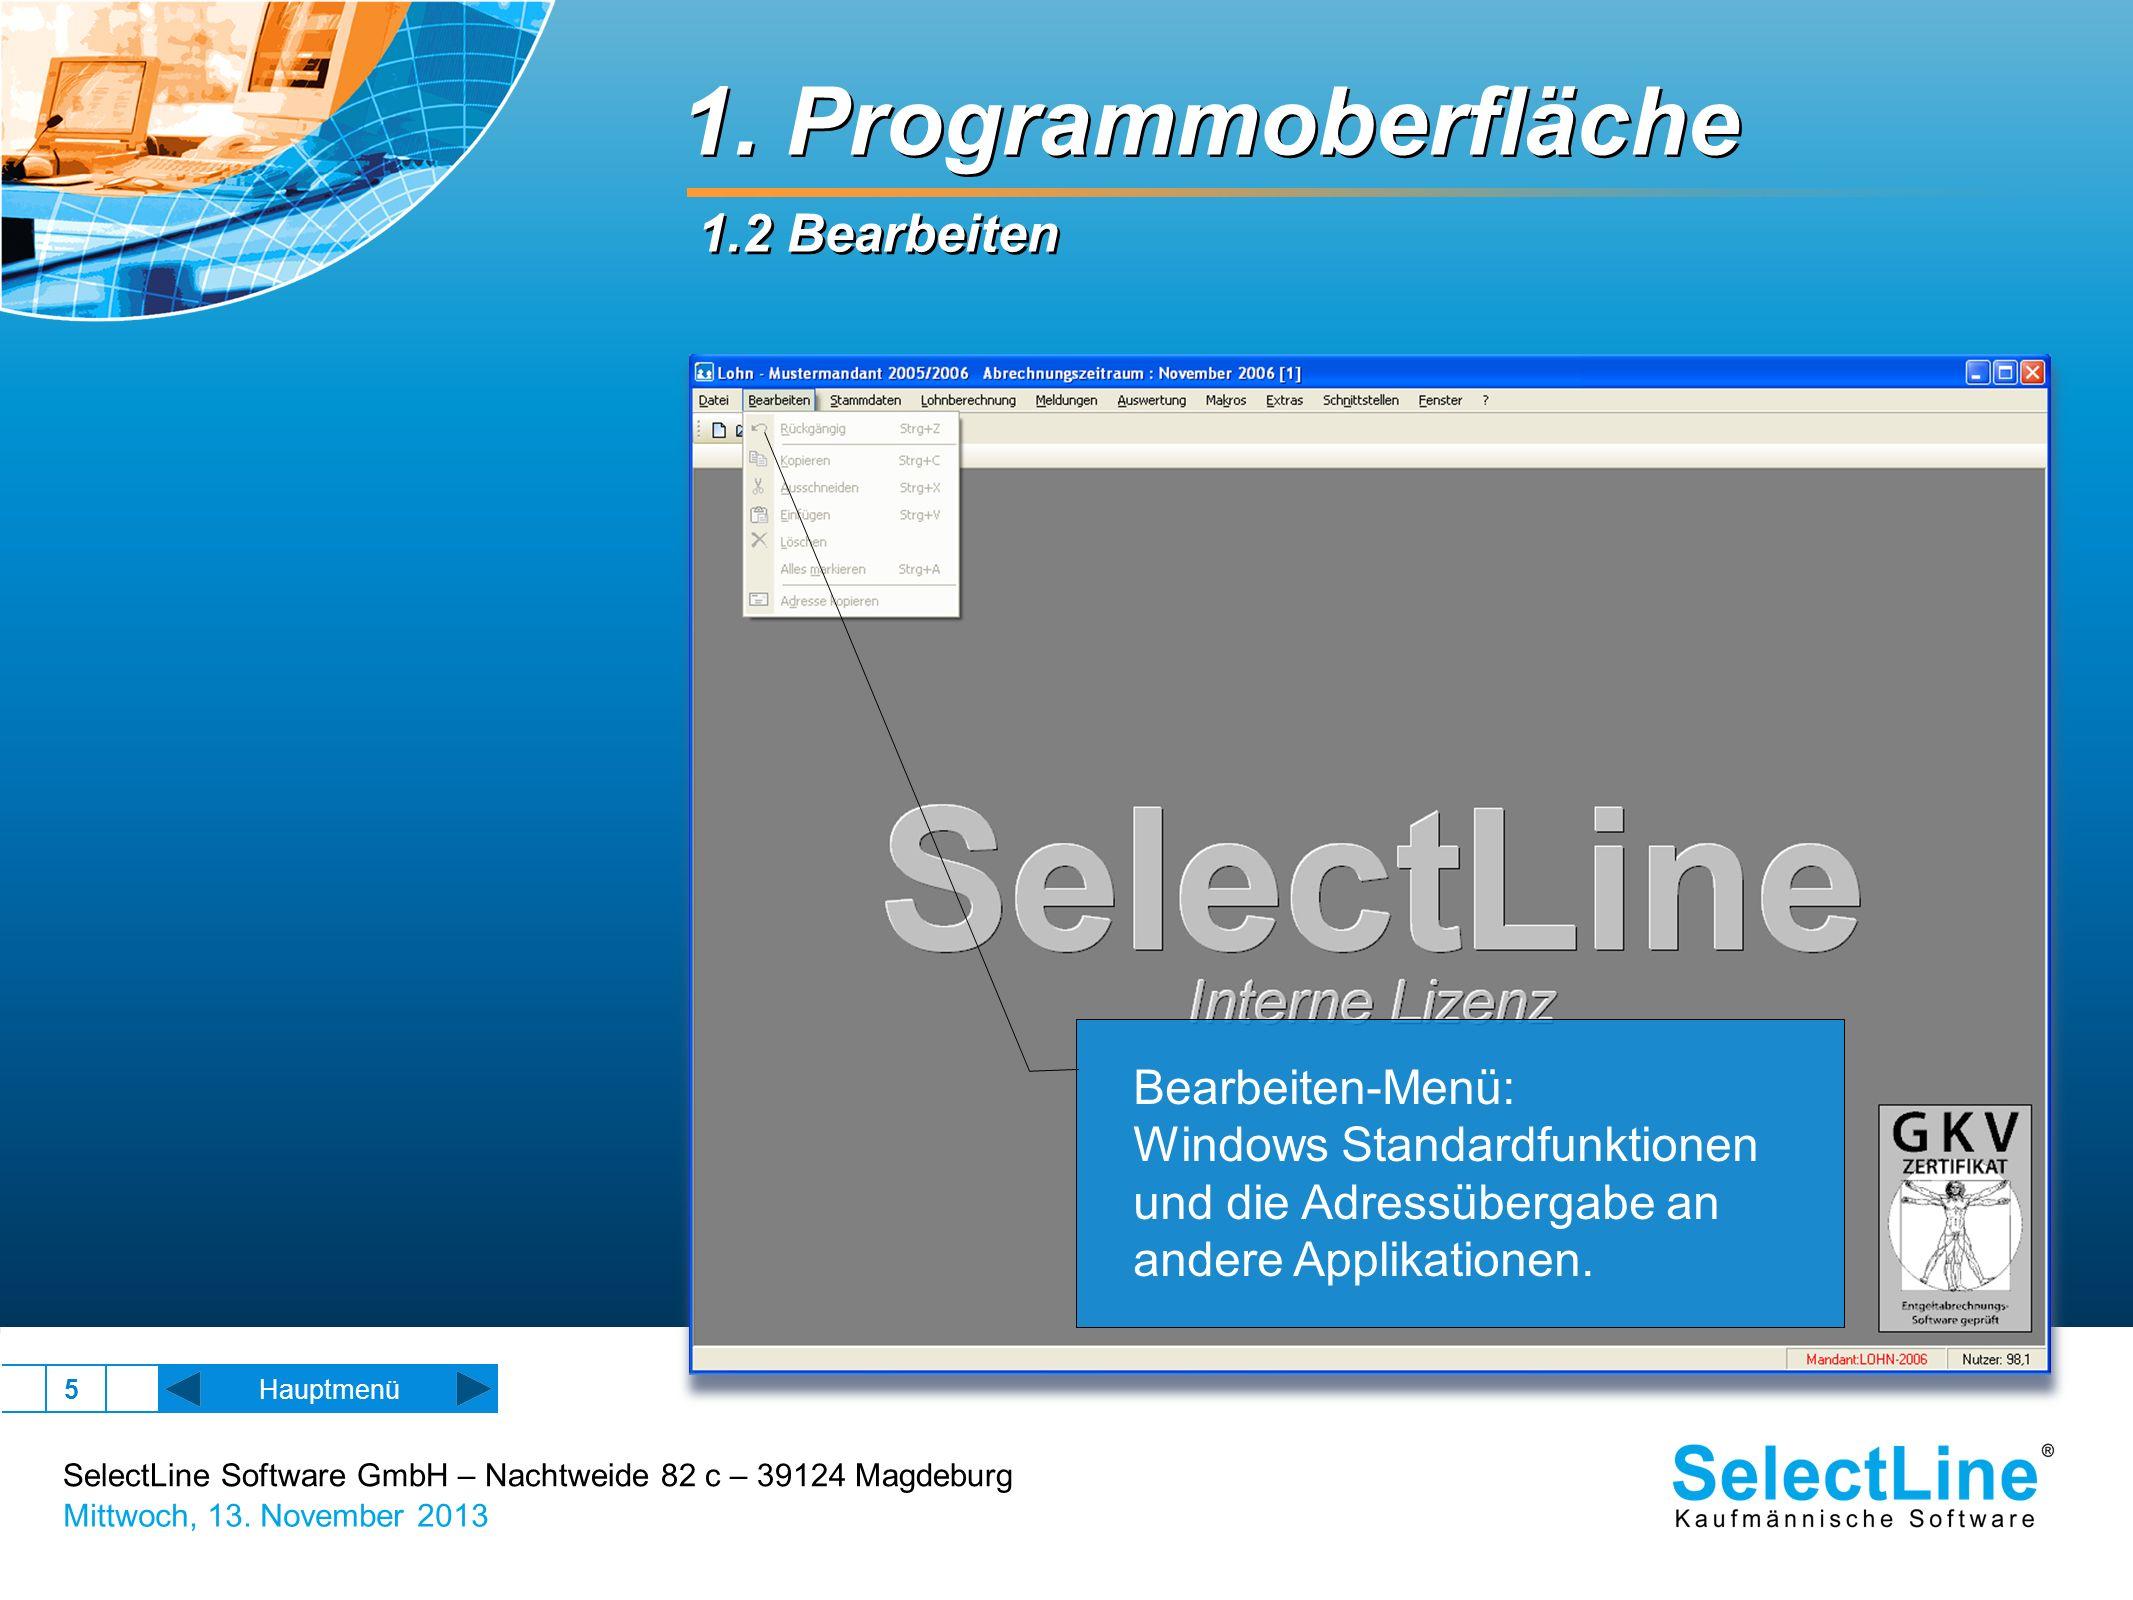 SelectLine Software GmbH – Nachtweide 82 c – 39124 Magdeburg Mittwoch, 13. November 2013 5 1. Programmoberfläche 1.2 Bearbeiten Hauptmenü Bearbeiten-M